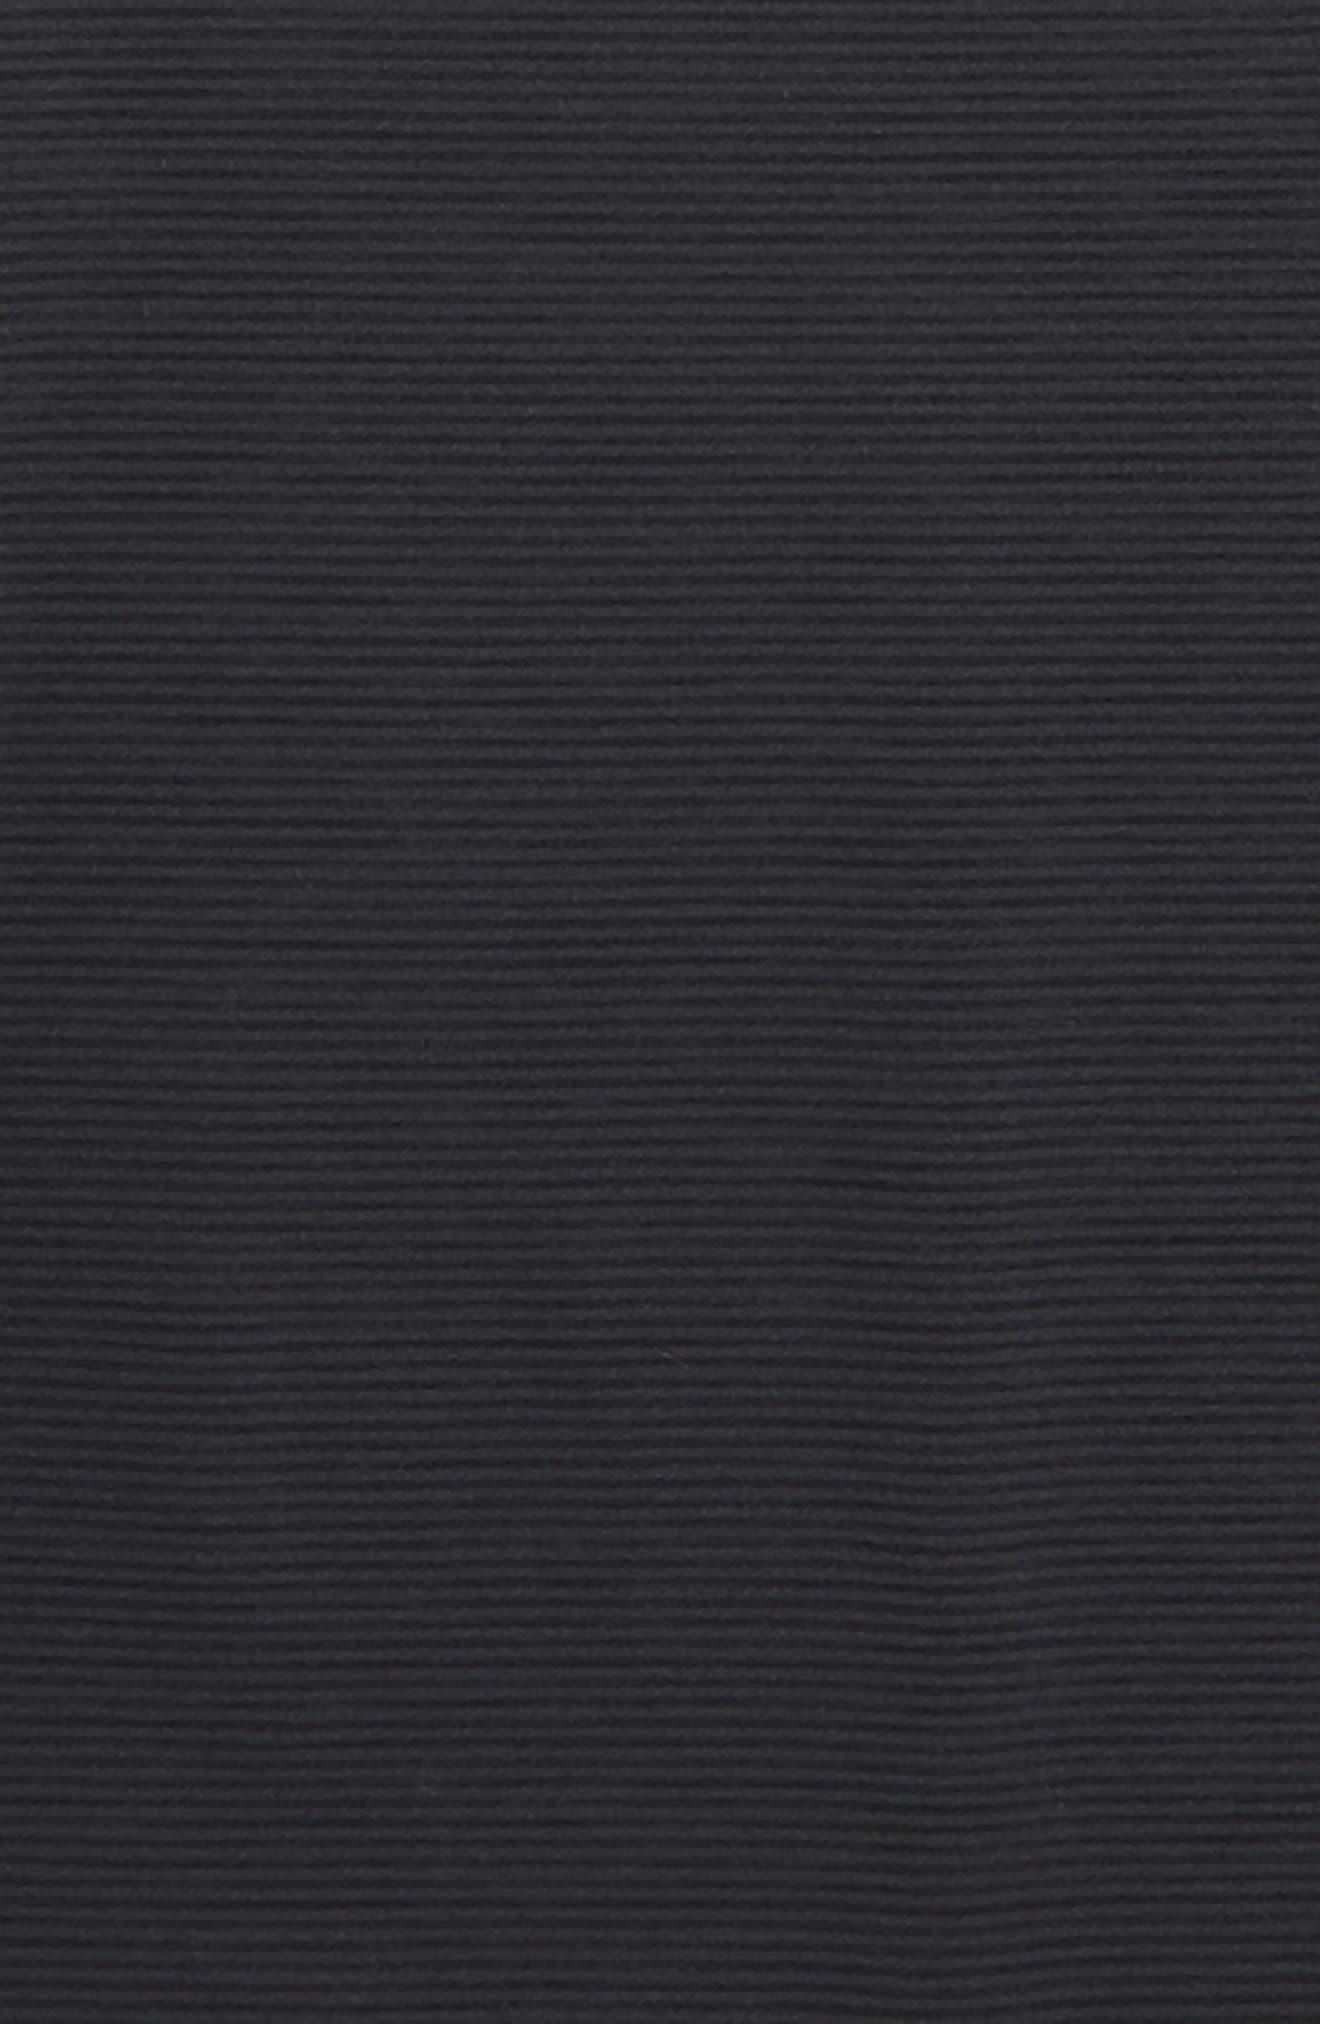 Stripe Knit & Mesh Top,                             Alternate thumbnail 2, color,                             BLACK- GREY STRIPE